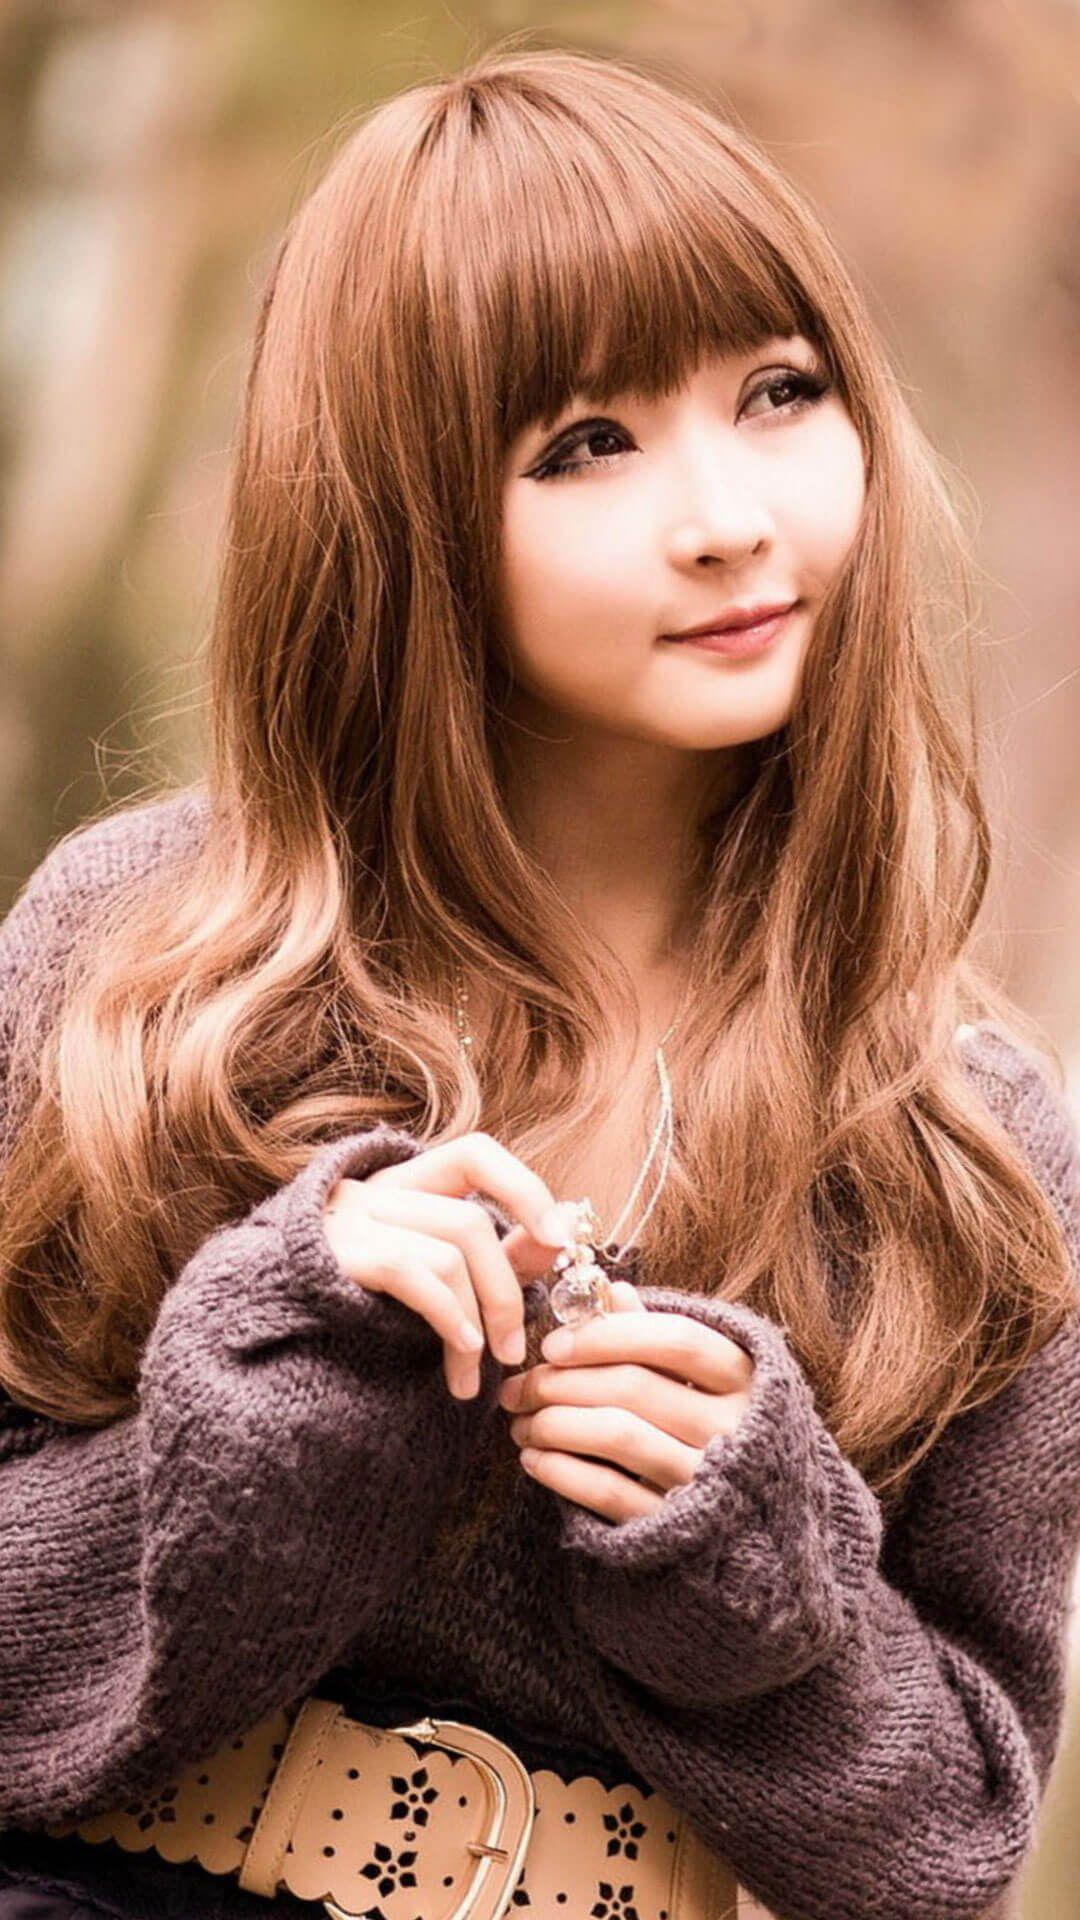 Cute Asian Girl HD Desktop Wallpaper Background download